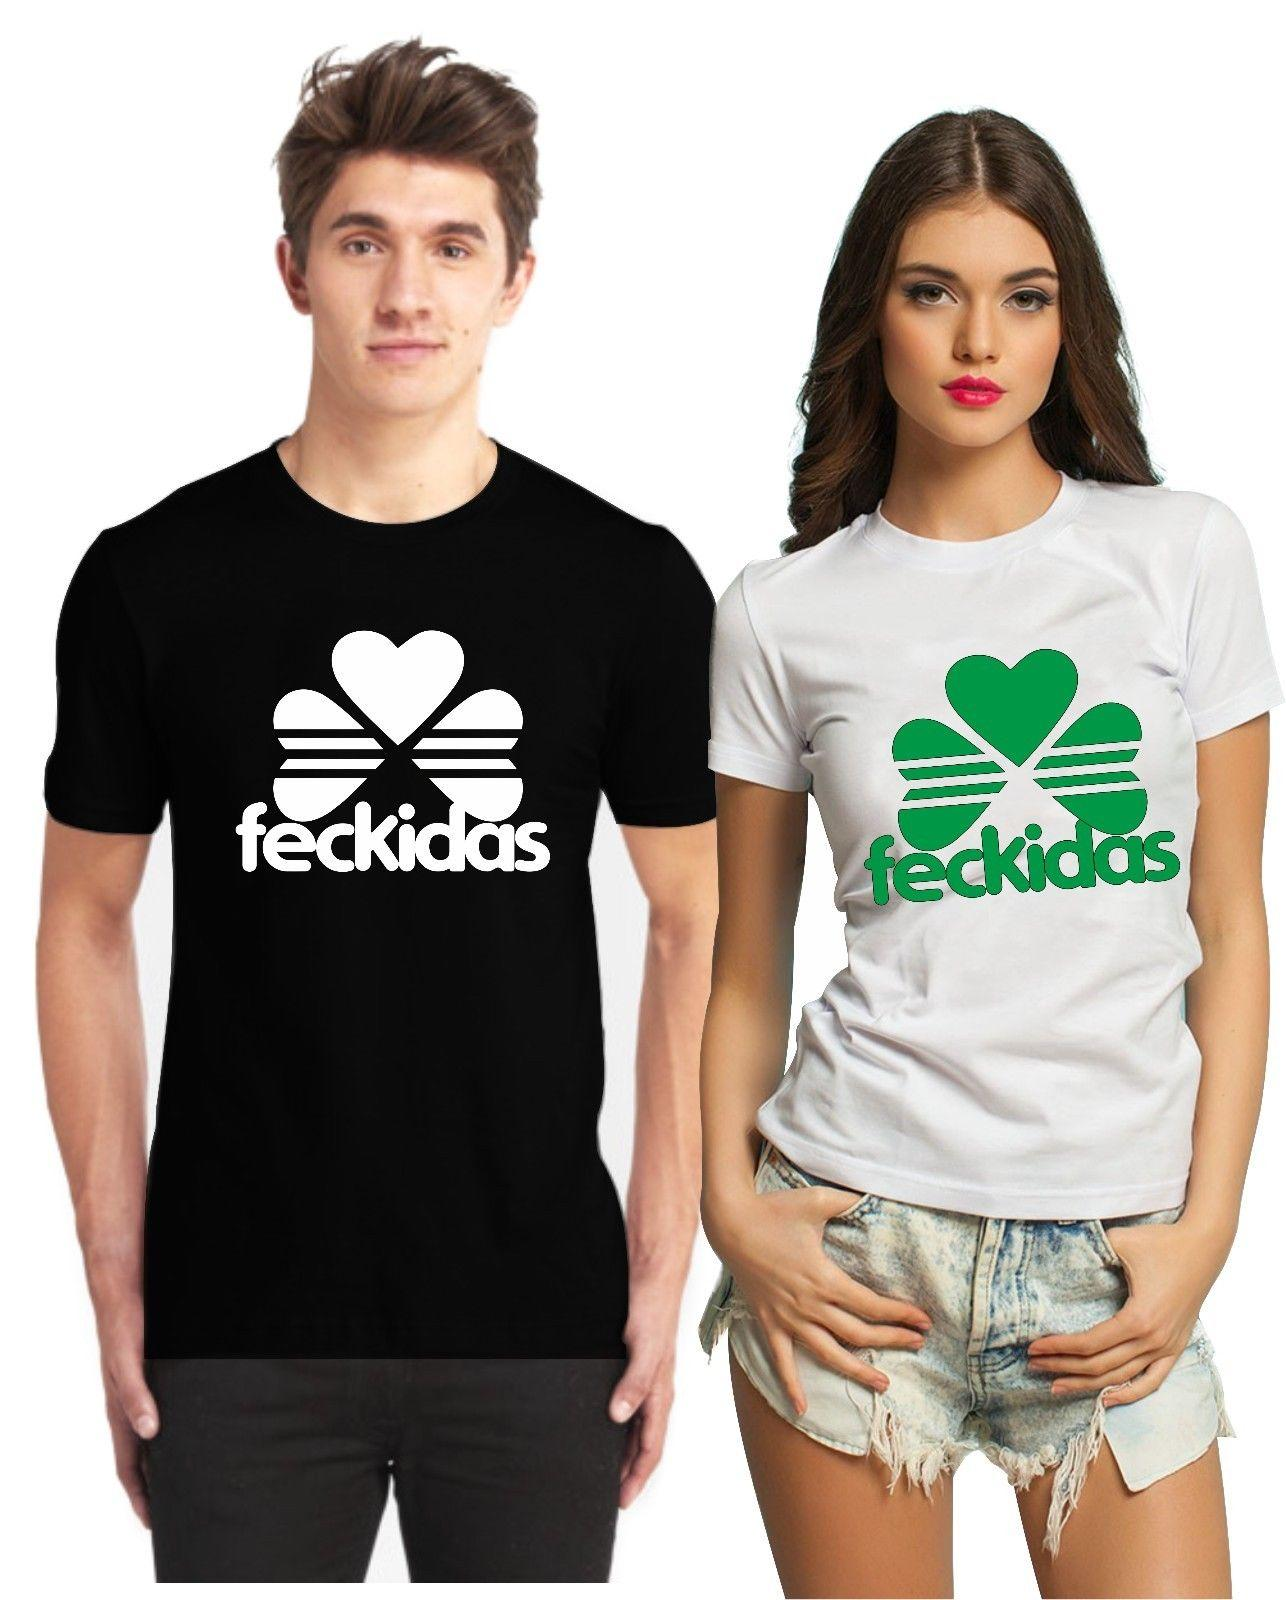 b7ad51081 Feckidas Patrick's Irish Paddy Ireland Merchandise Funny St Patricks Day T  Shirt Cool Casual pride t shirt men